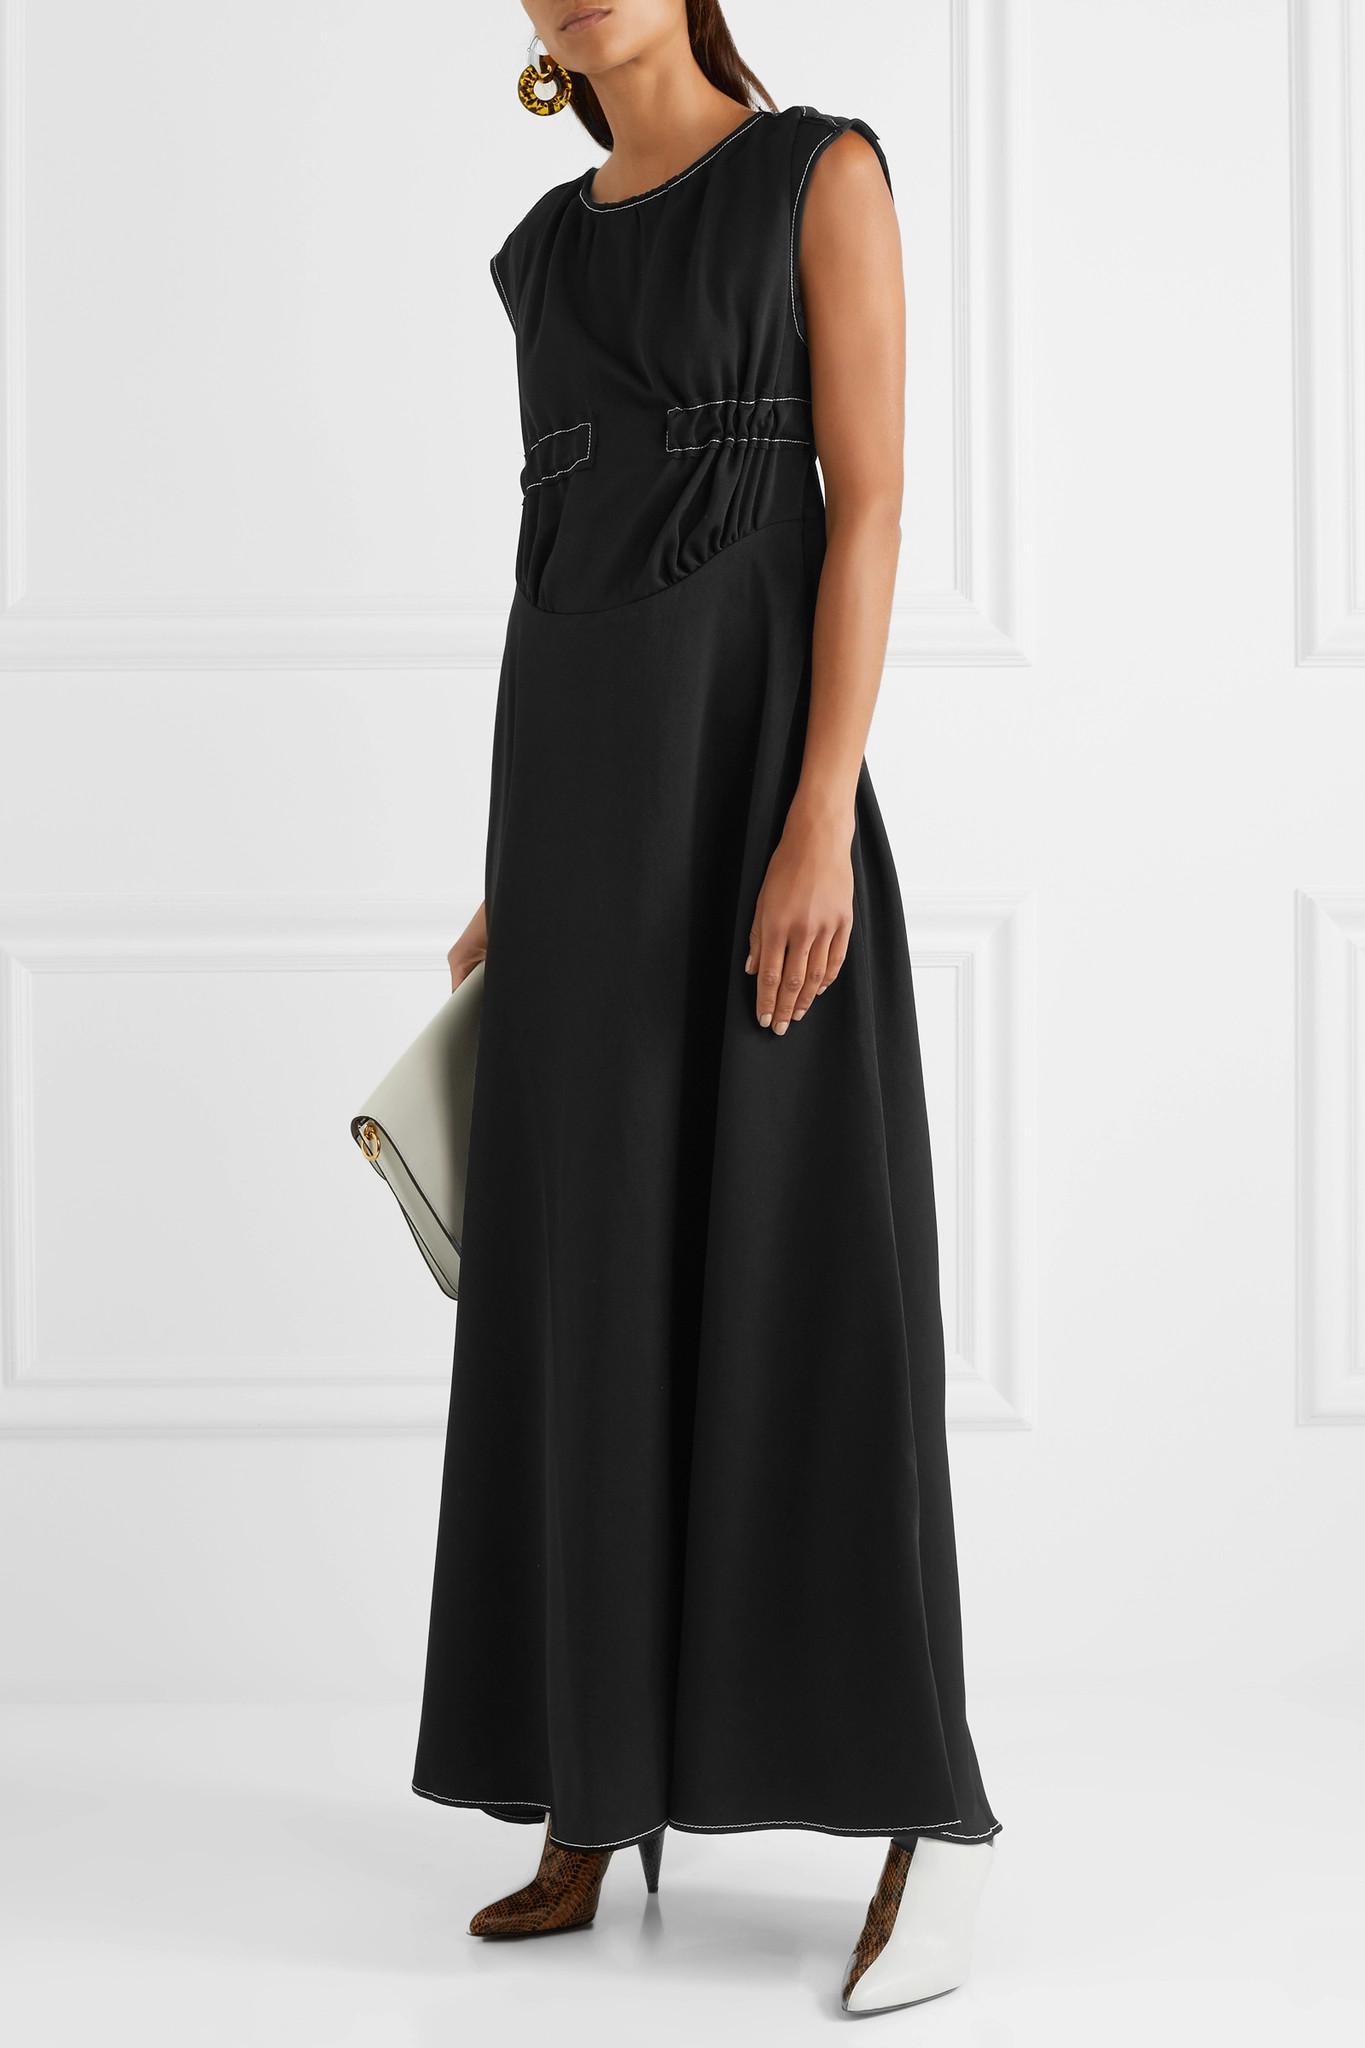 Lena Embroidered Crepe Maxi Dress - Black Rejina Pyo iIprM2kyBp